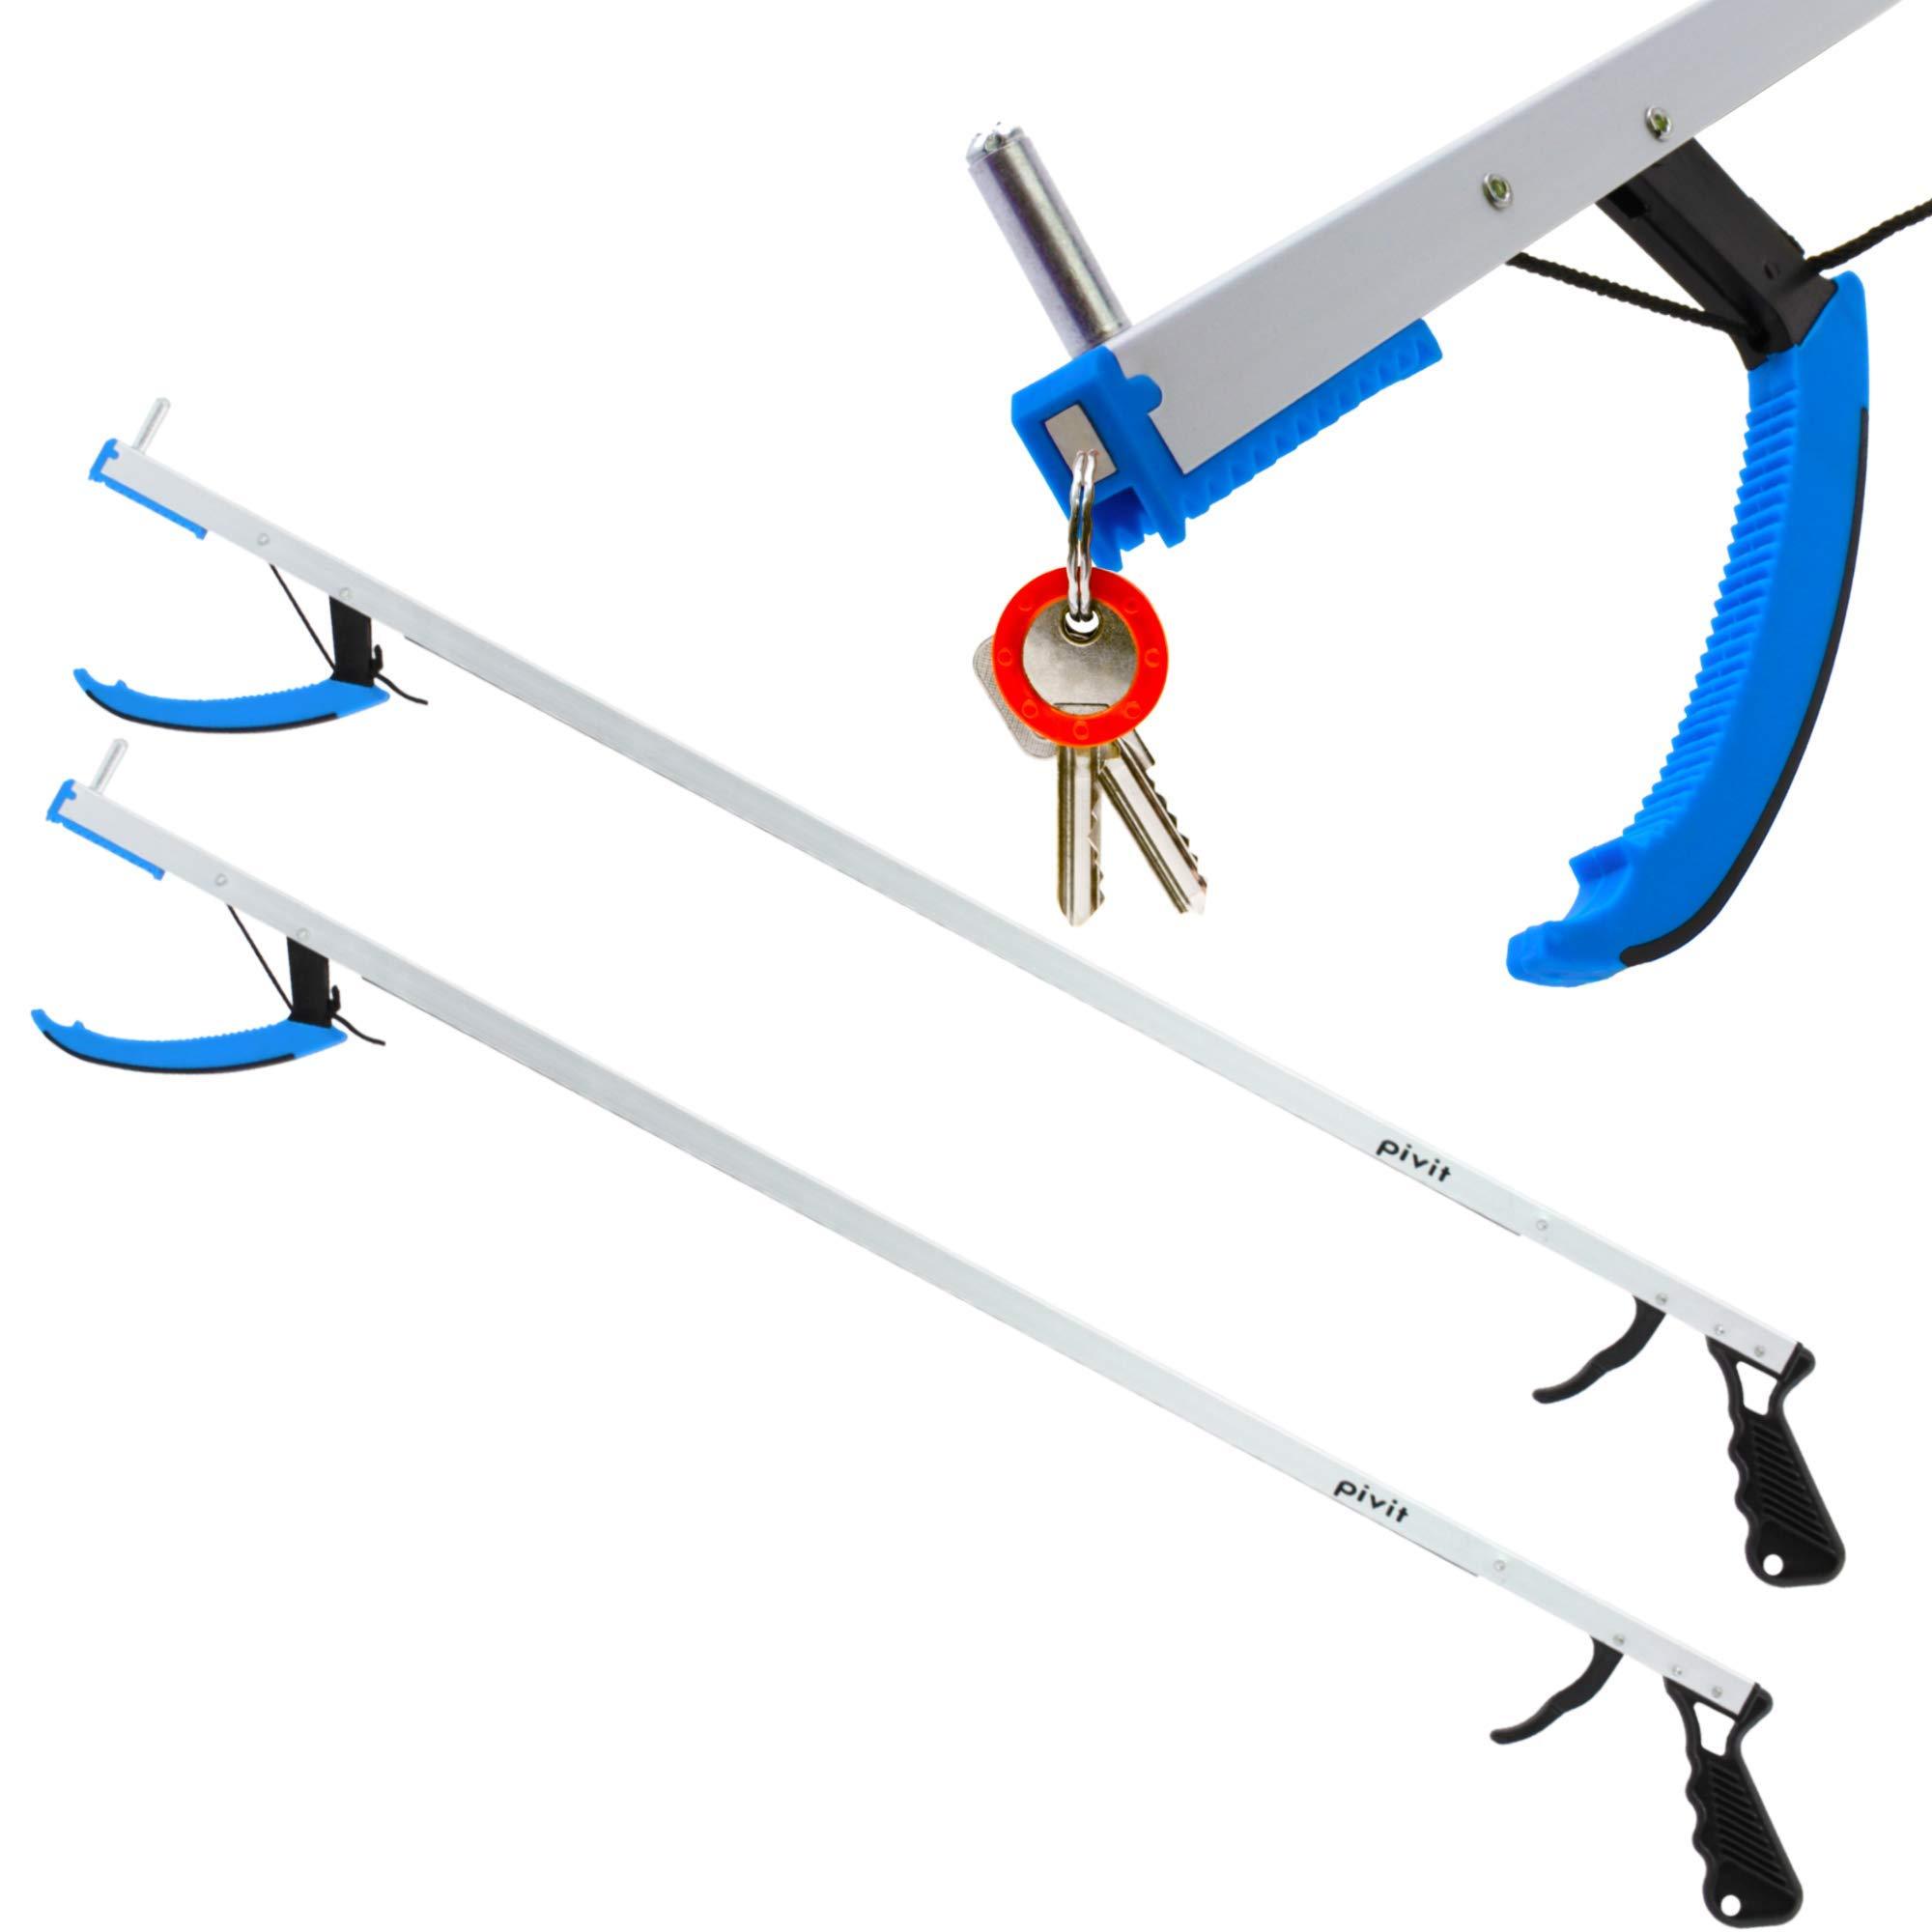 Pivit Claw Reacher Grabber | 32'' 2-Pack | Long Reach Mobility Aid | Heavy Duty Reaching Assist Tool, Fishing, Trash Garbage Picker, Garden Nabber | Magnetic Tip Elderly Pick Up Extender Arm (Blue)